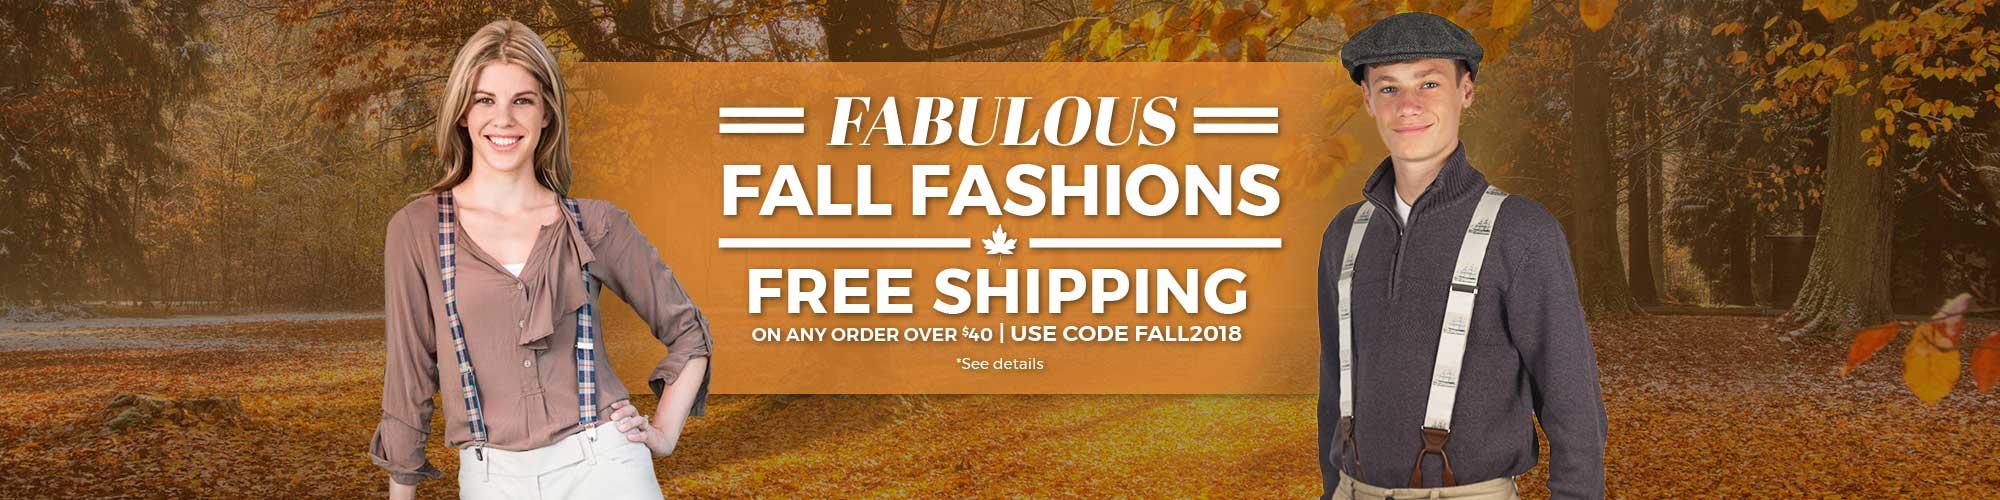 fabulous-fall-fashions-mobile-2018